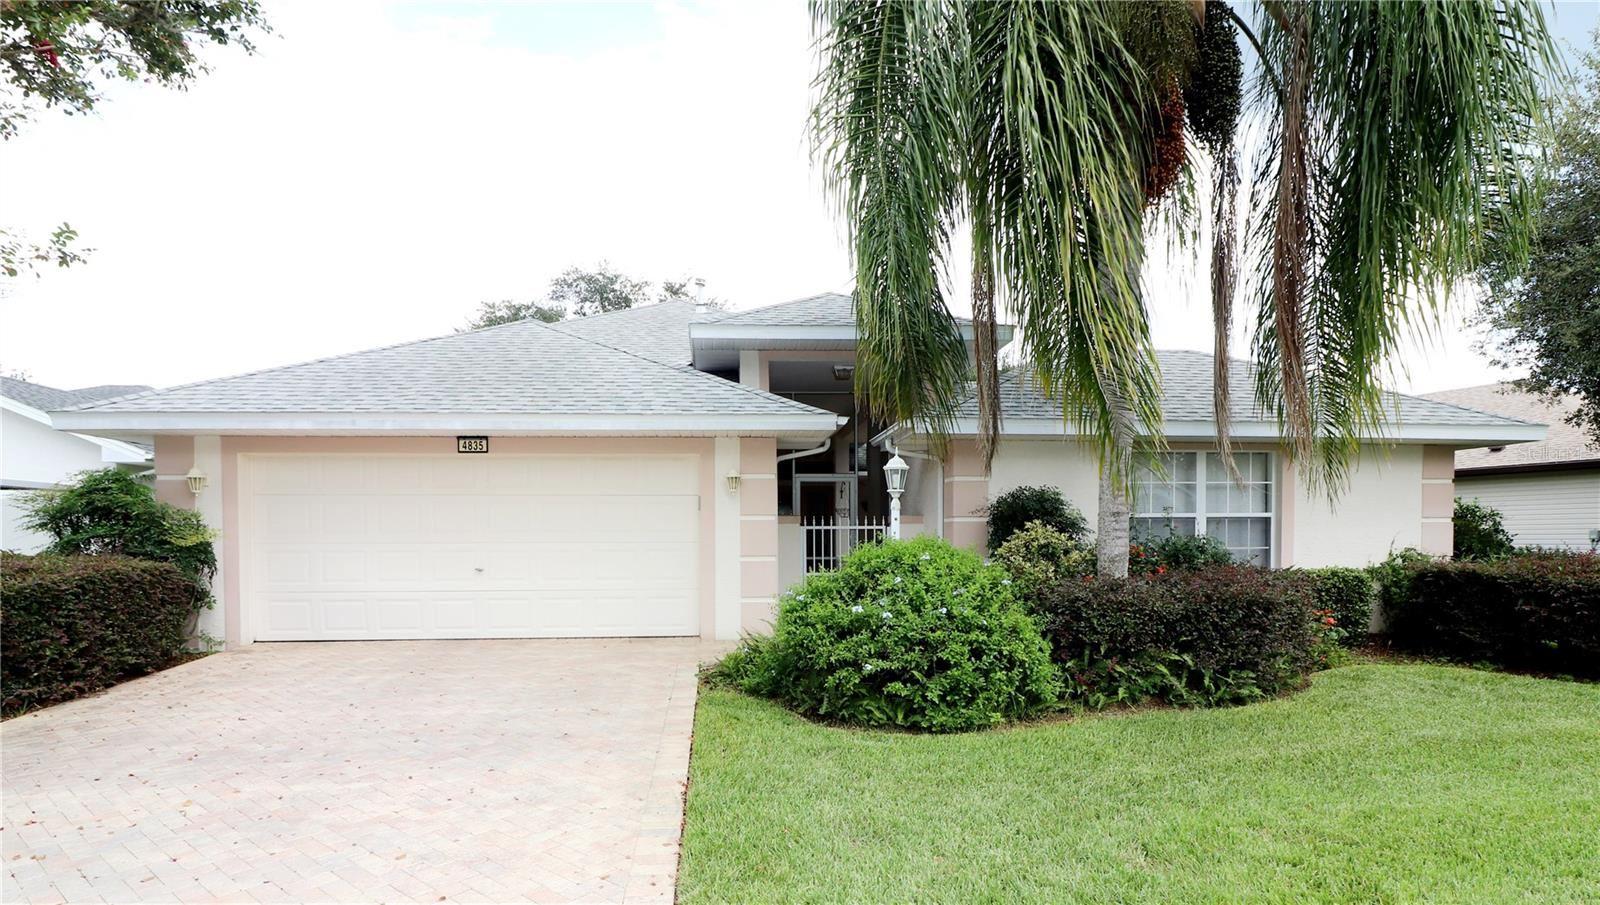 4835 SAINT ANDREWS ARCADE, Leesburg, FL 34748 - #: G5045770